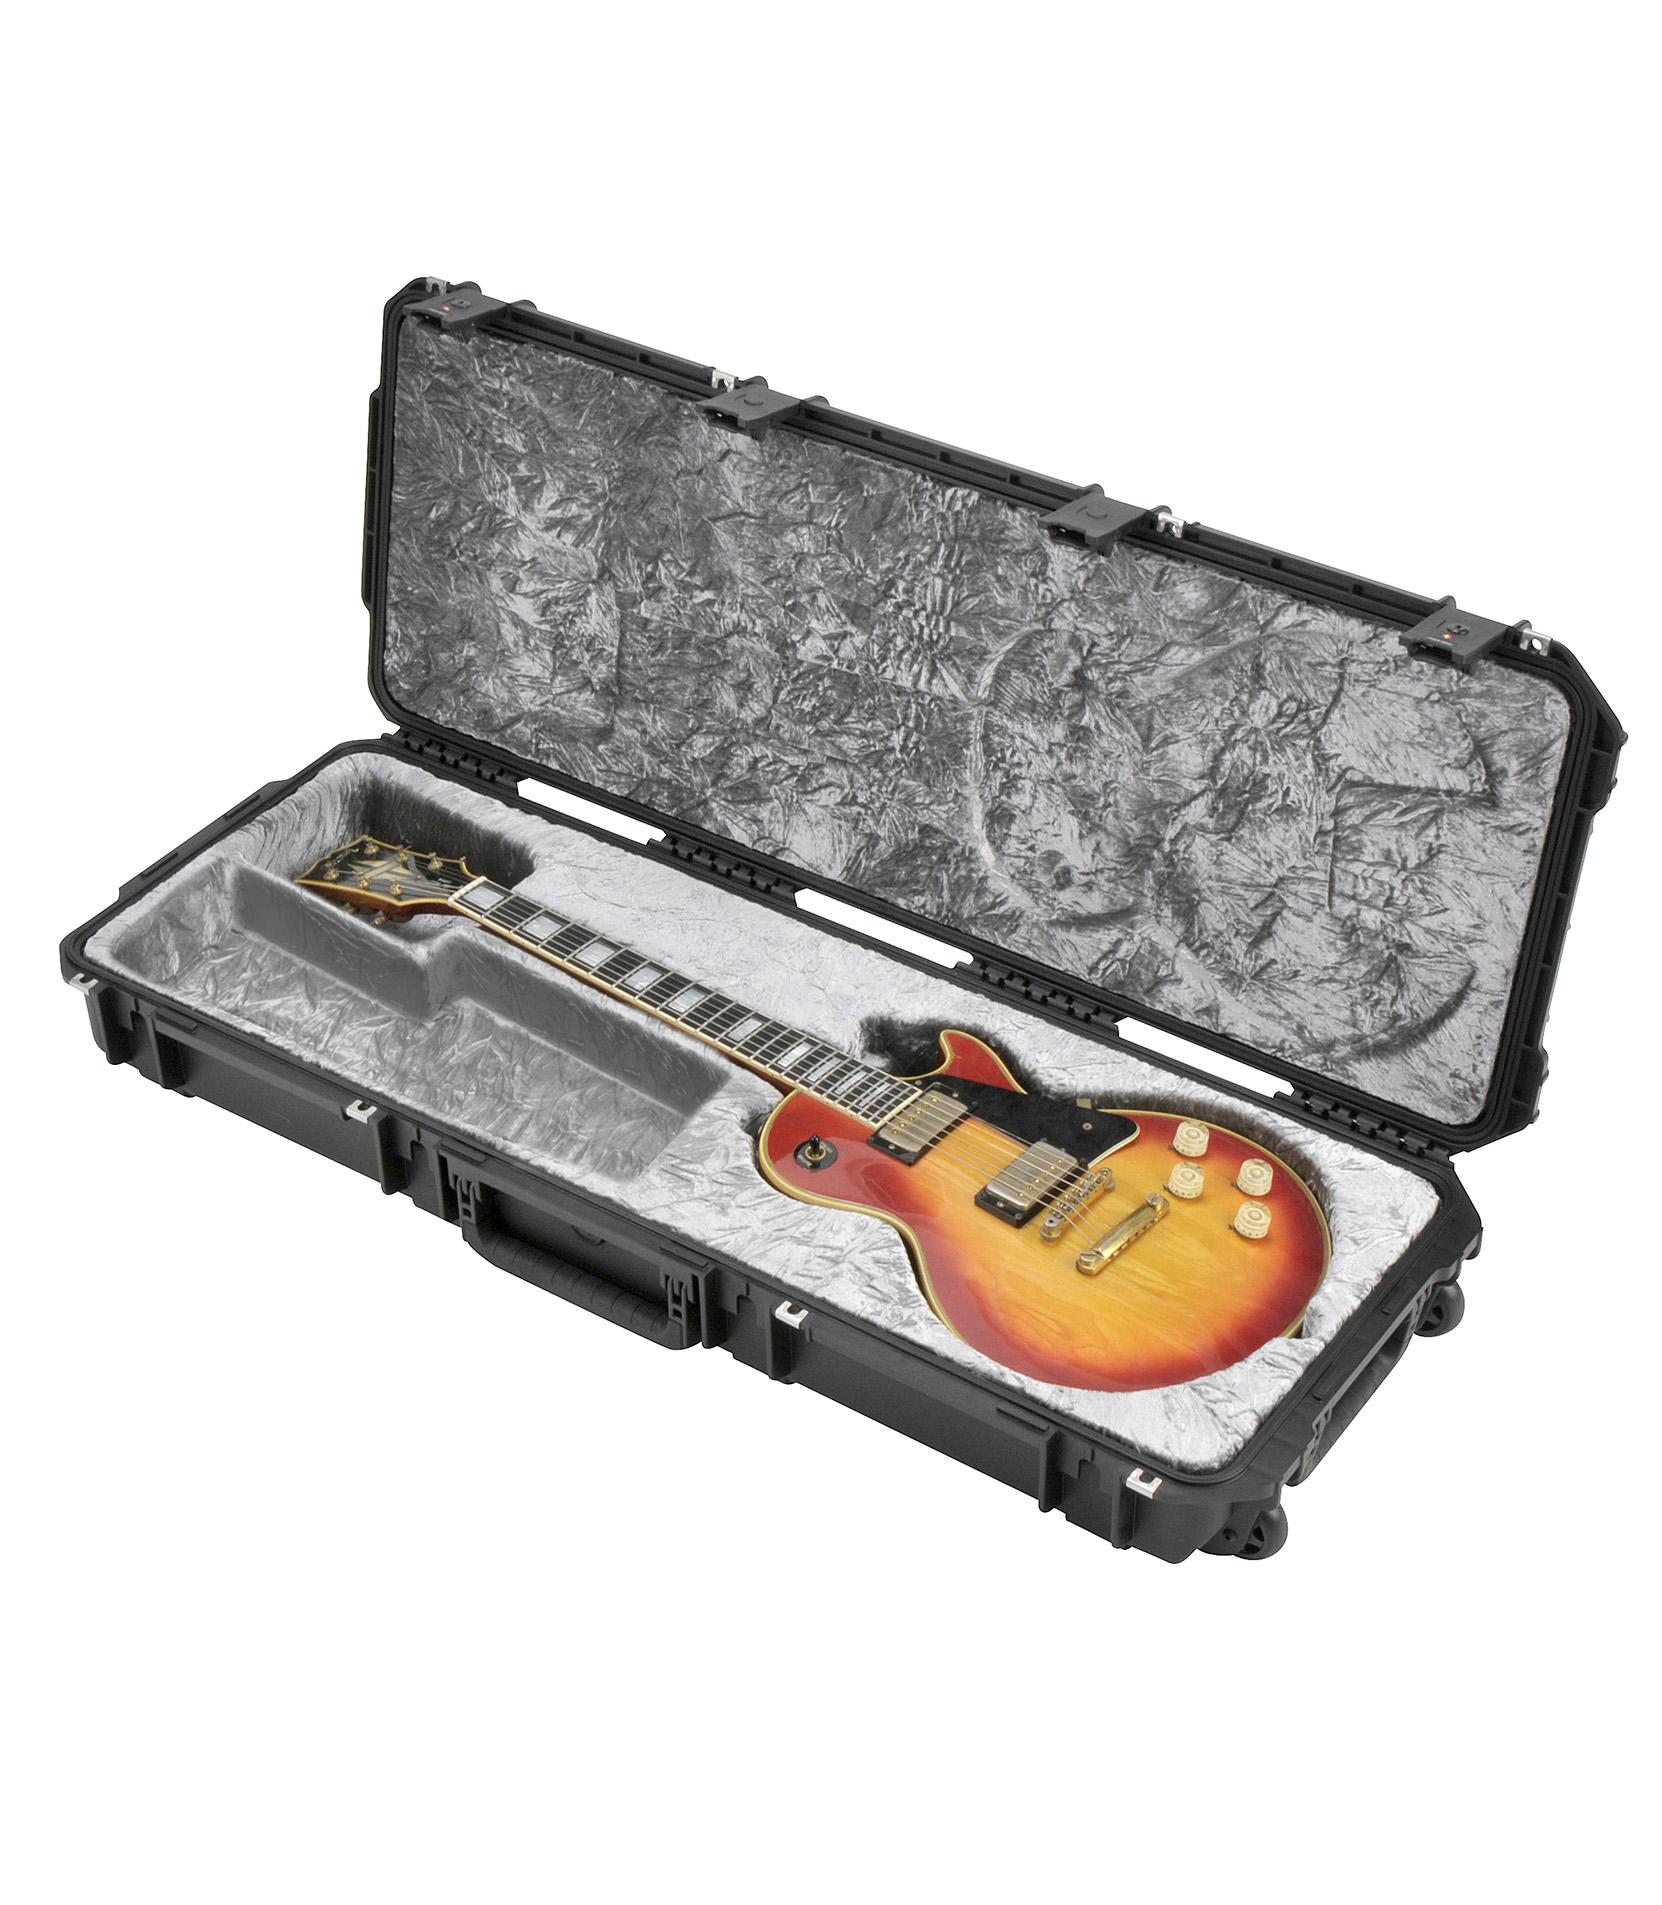 skb - 3i 4214 56 Injection molded Les Paul Flight Case - info@melodyhousemi.com